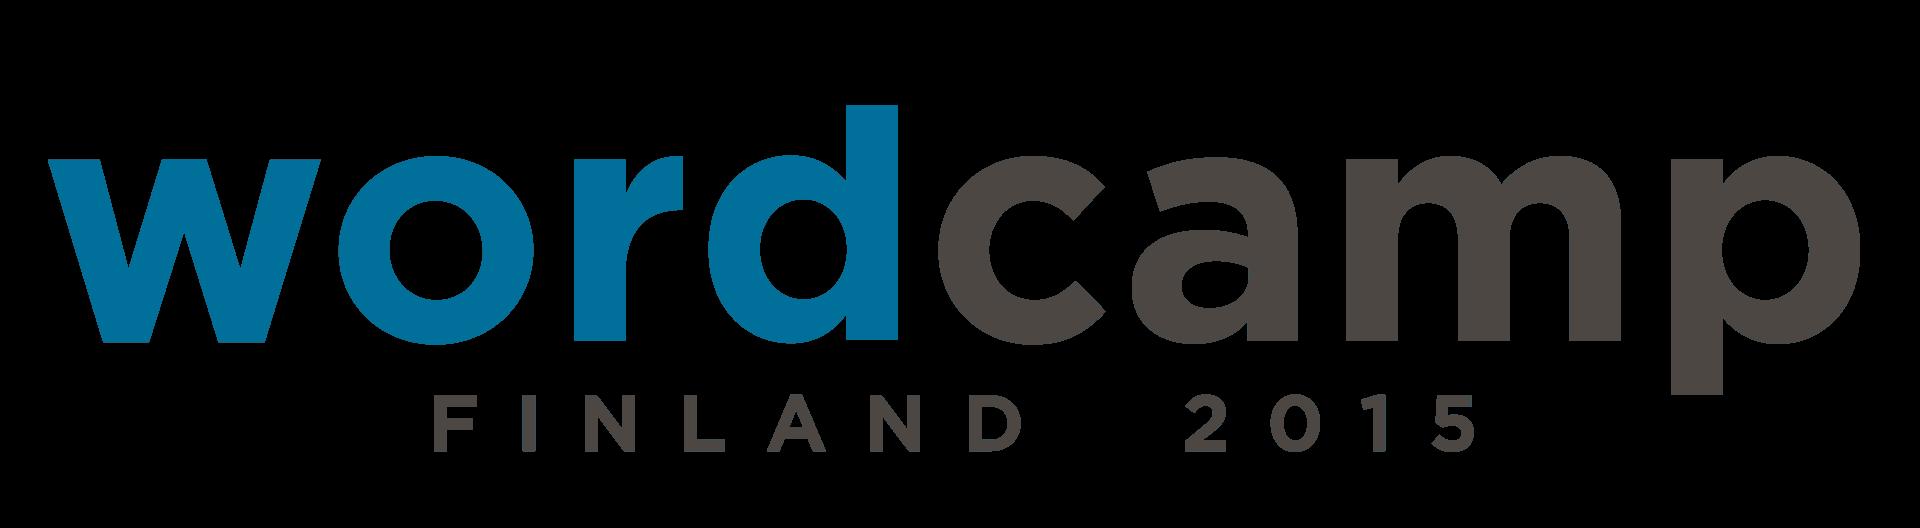 wordcamp_finland_twotone